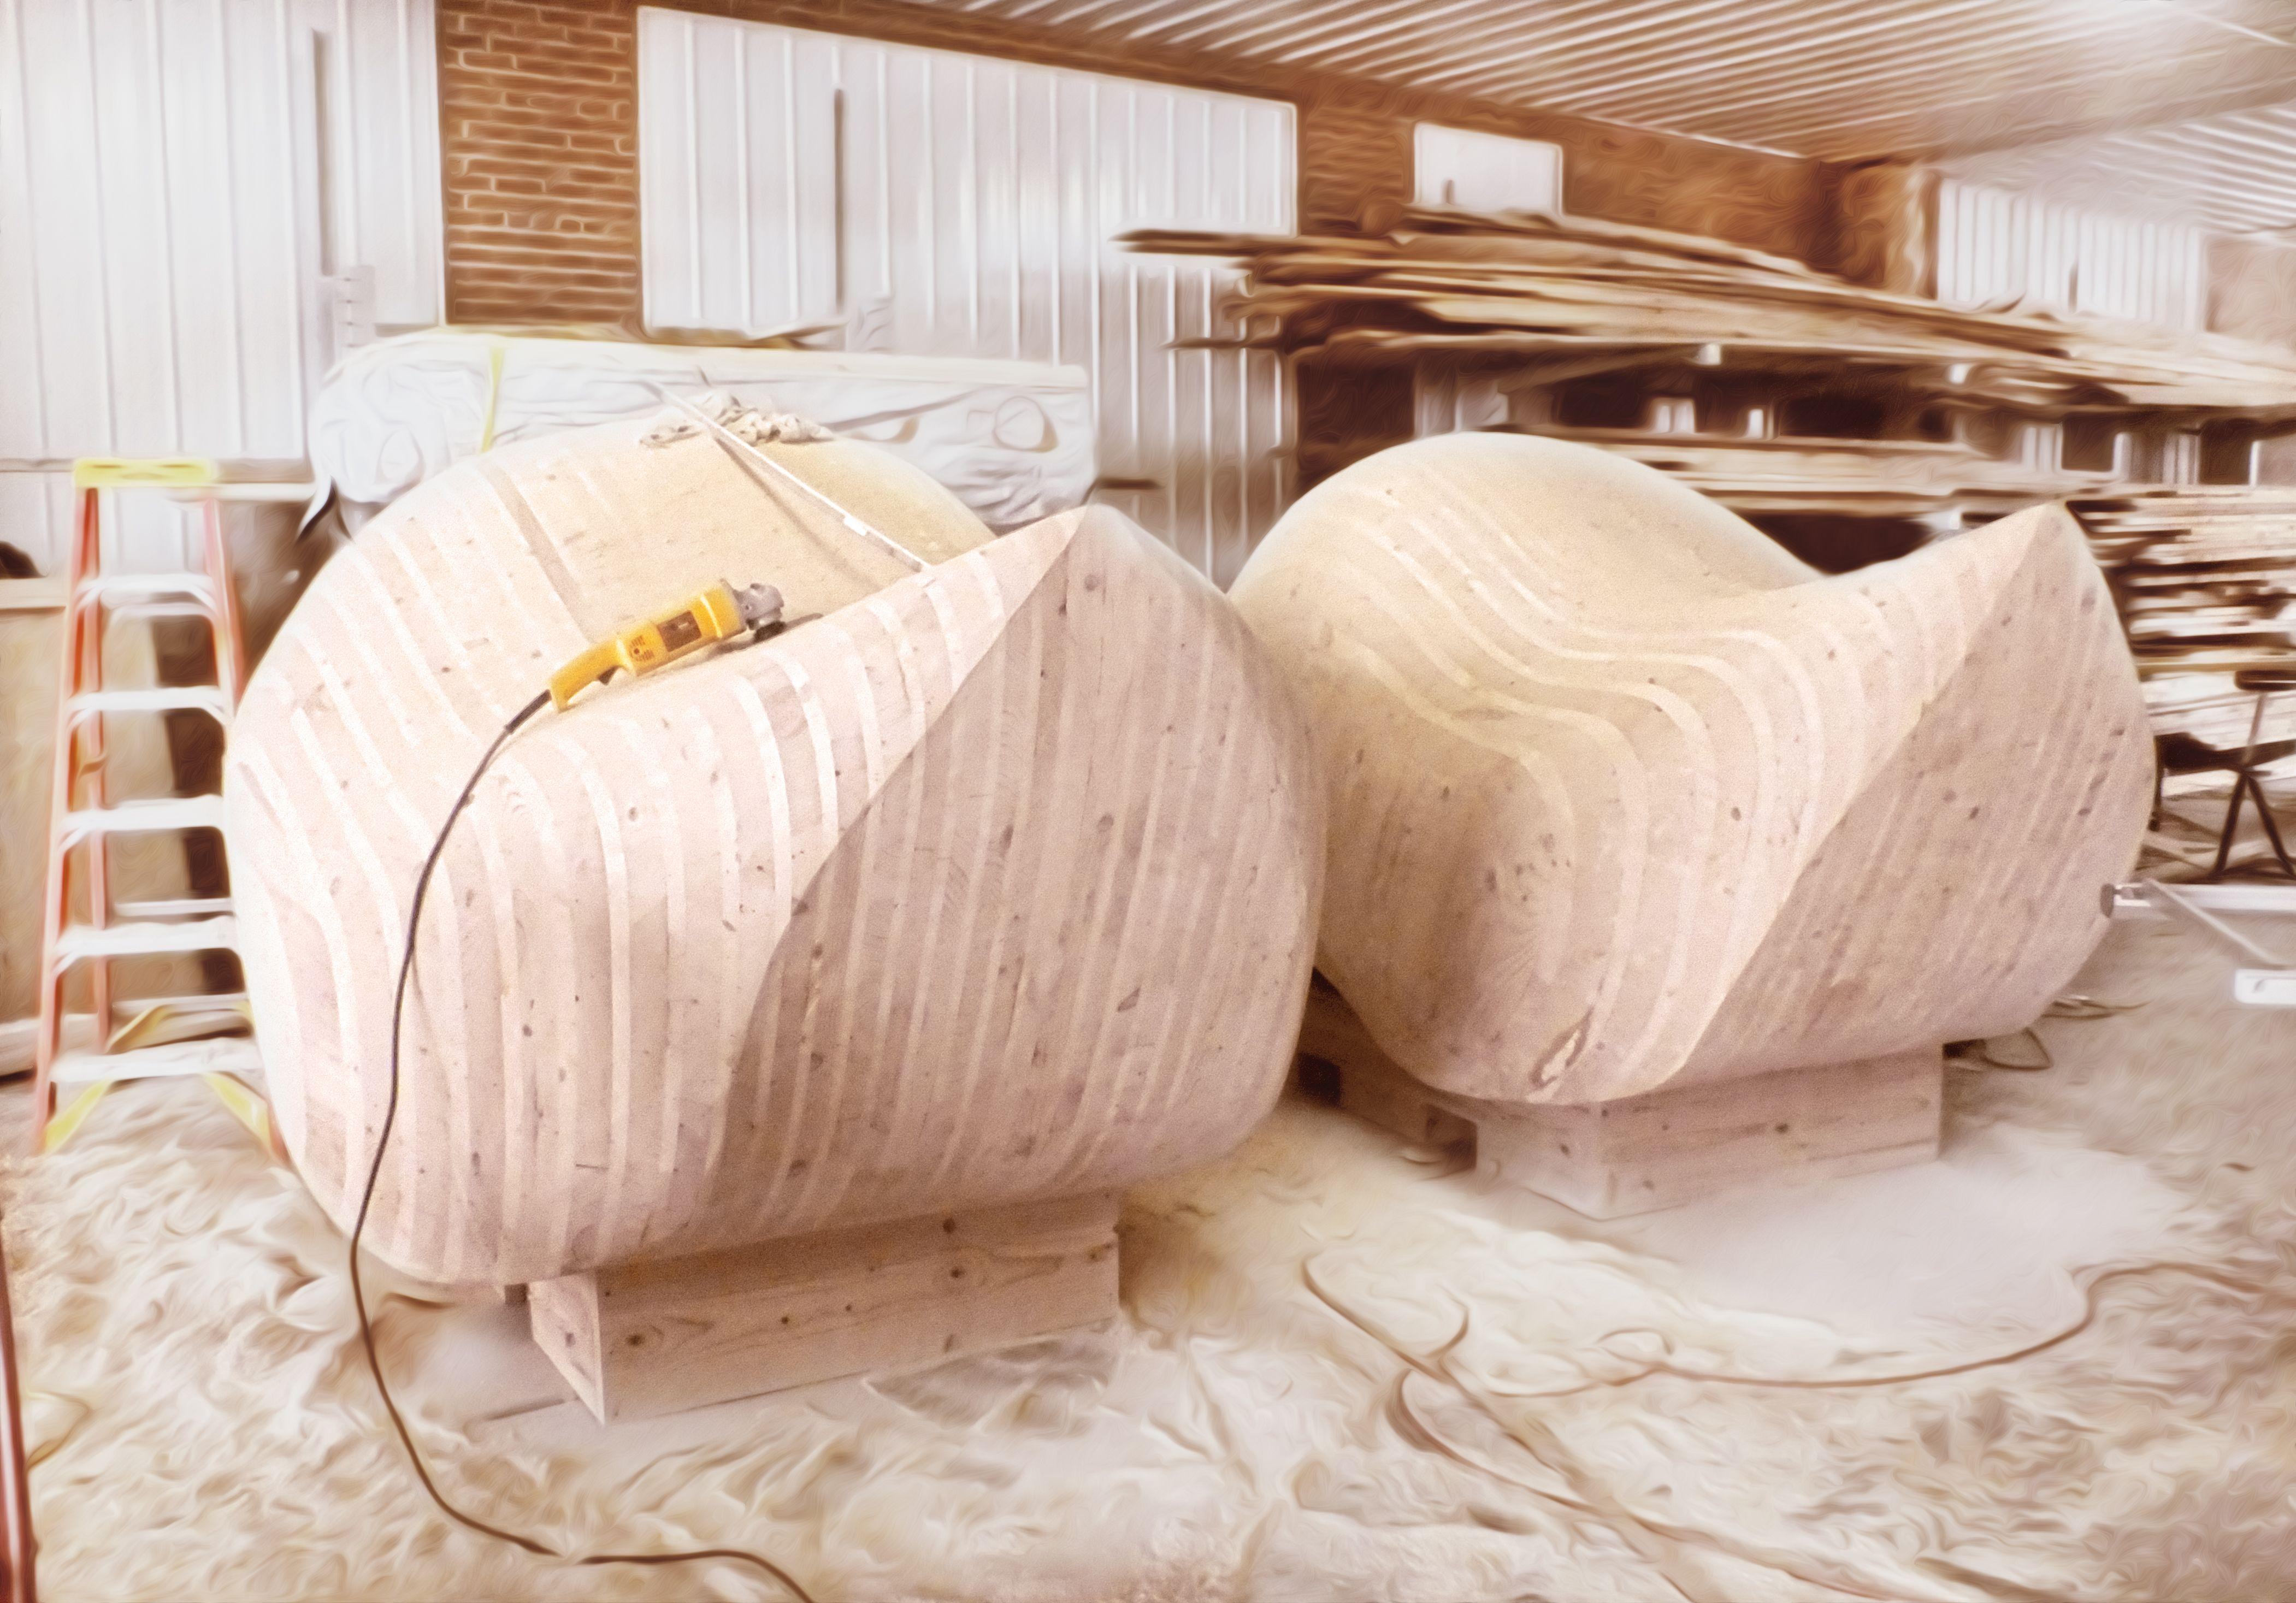 Casey Illinois Worlds Largest Wooden Shoeclogs Under